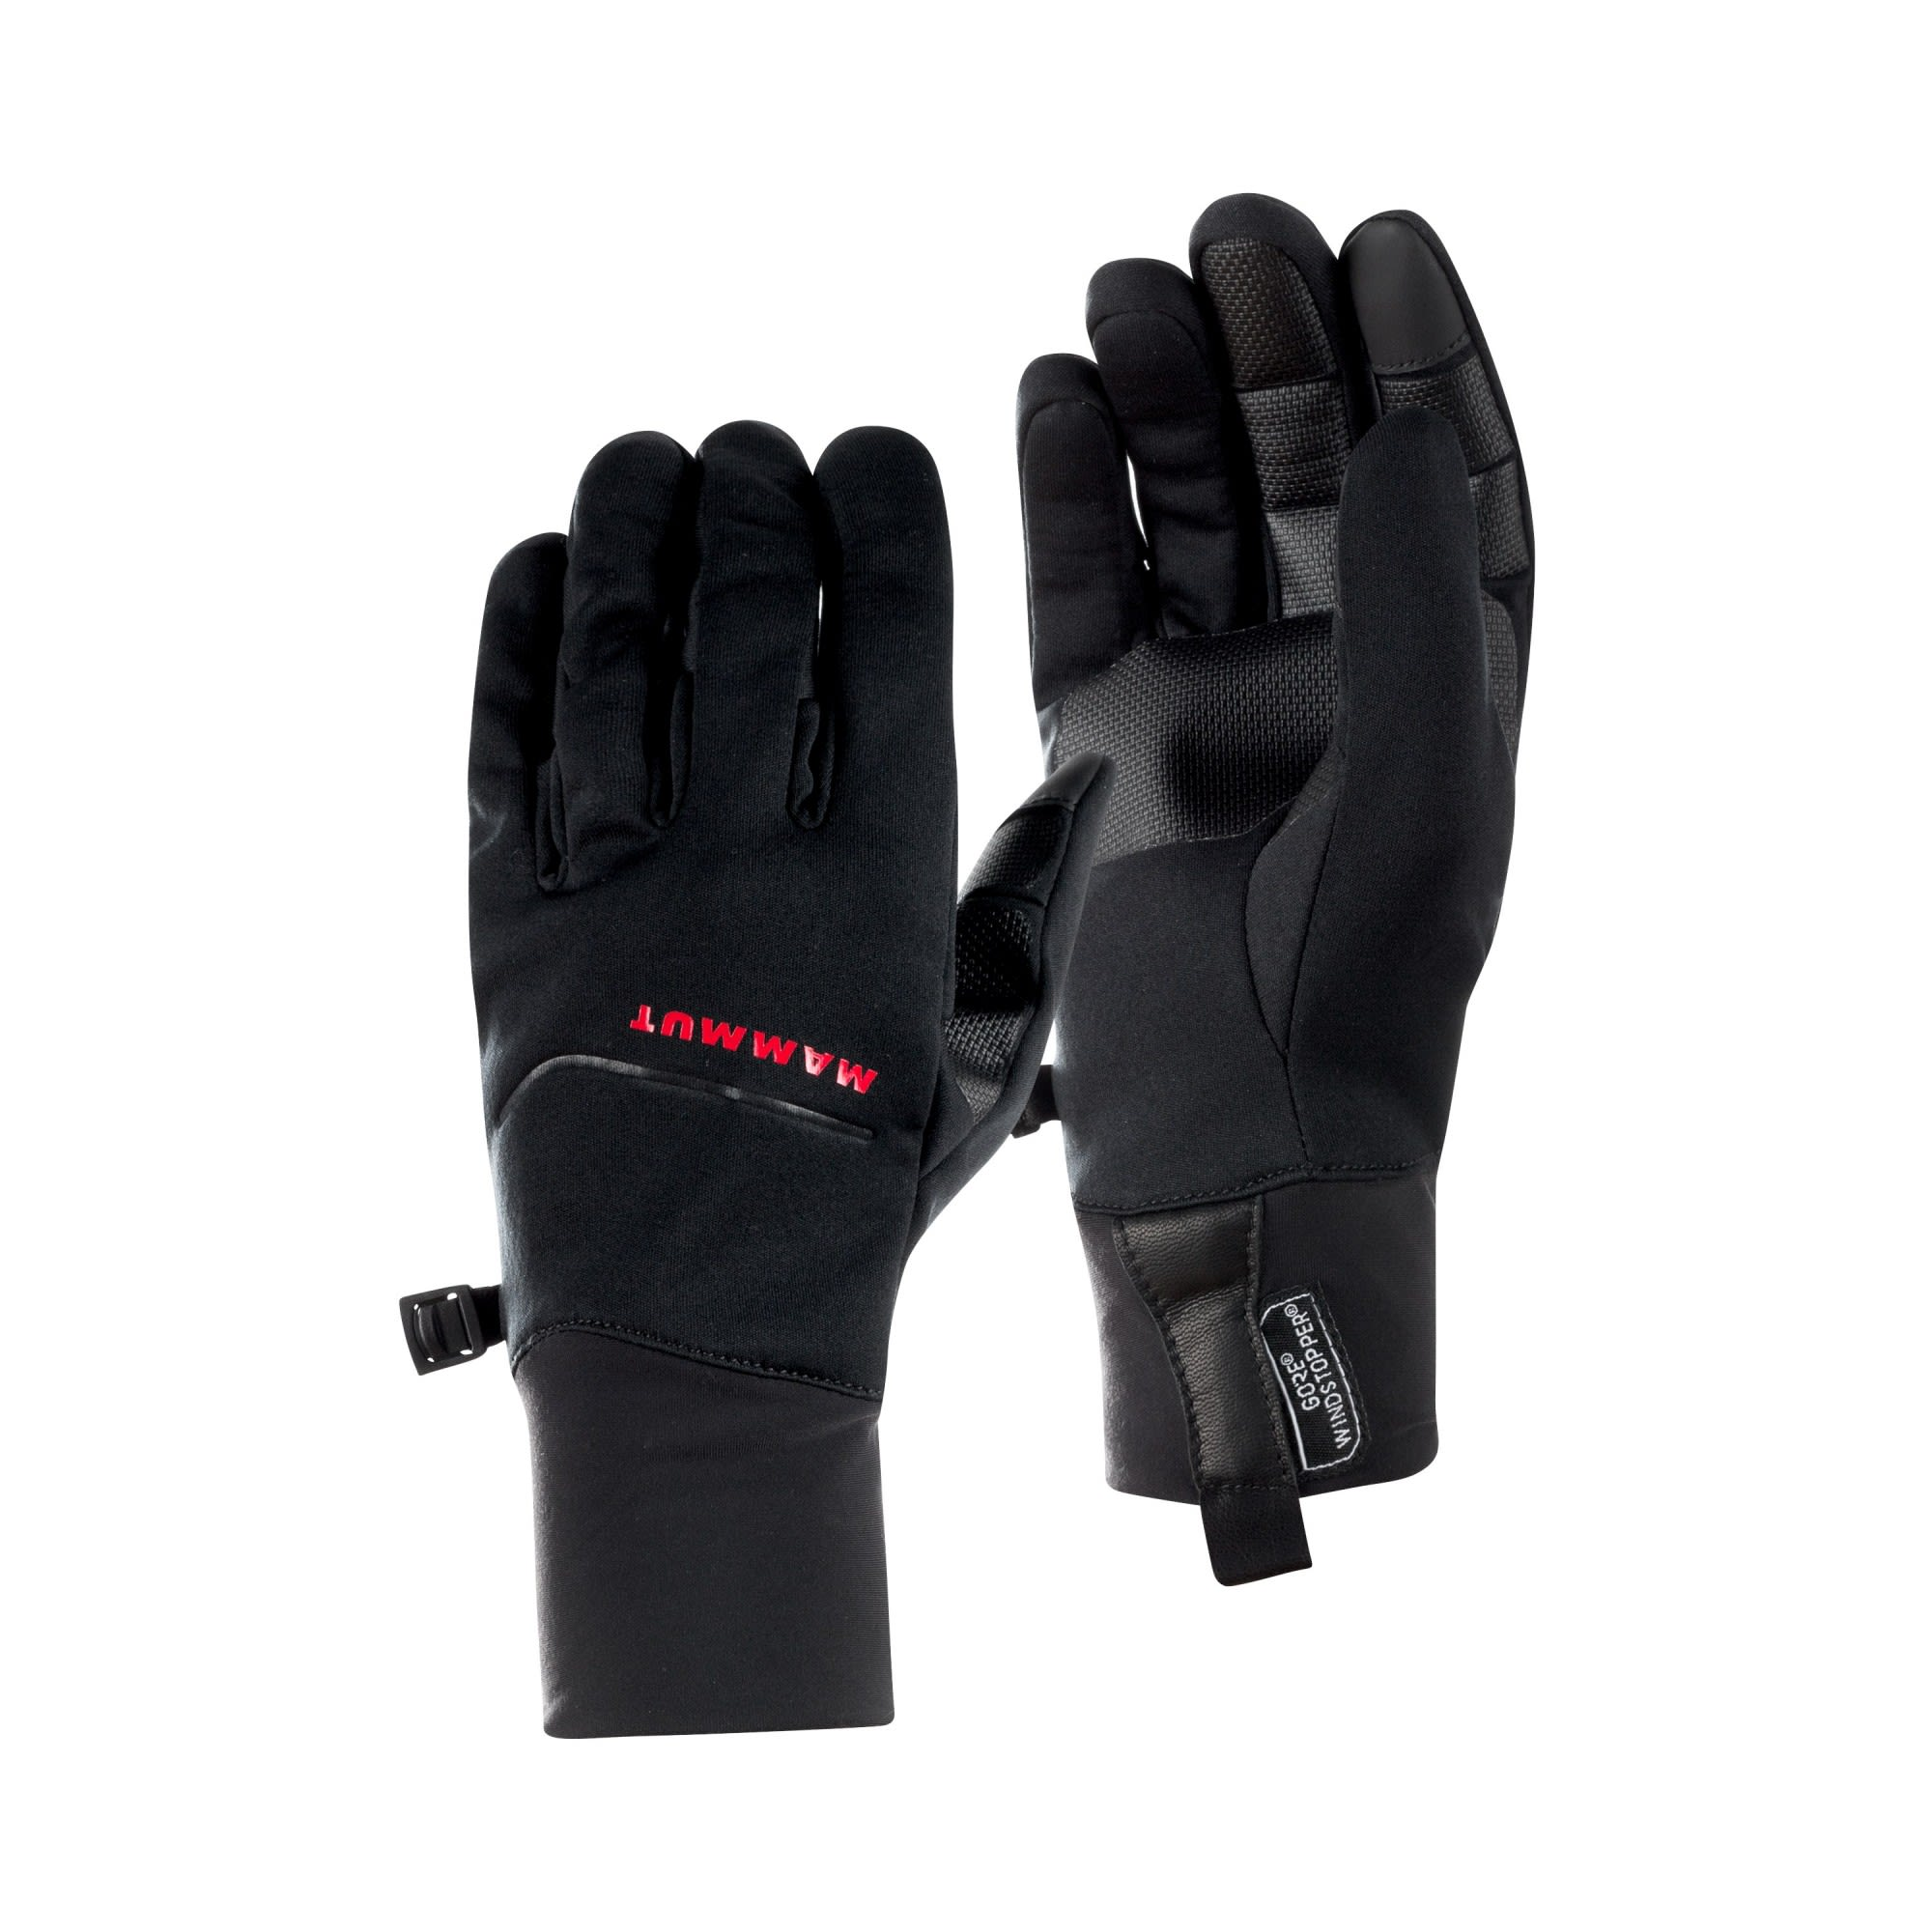 Mammut Astro Glove Schwarz, Daunen Accessoires, 8